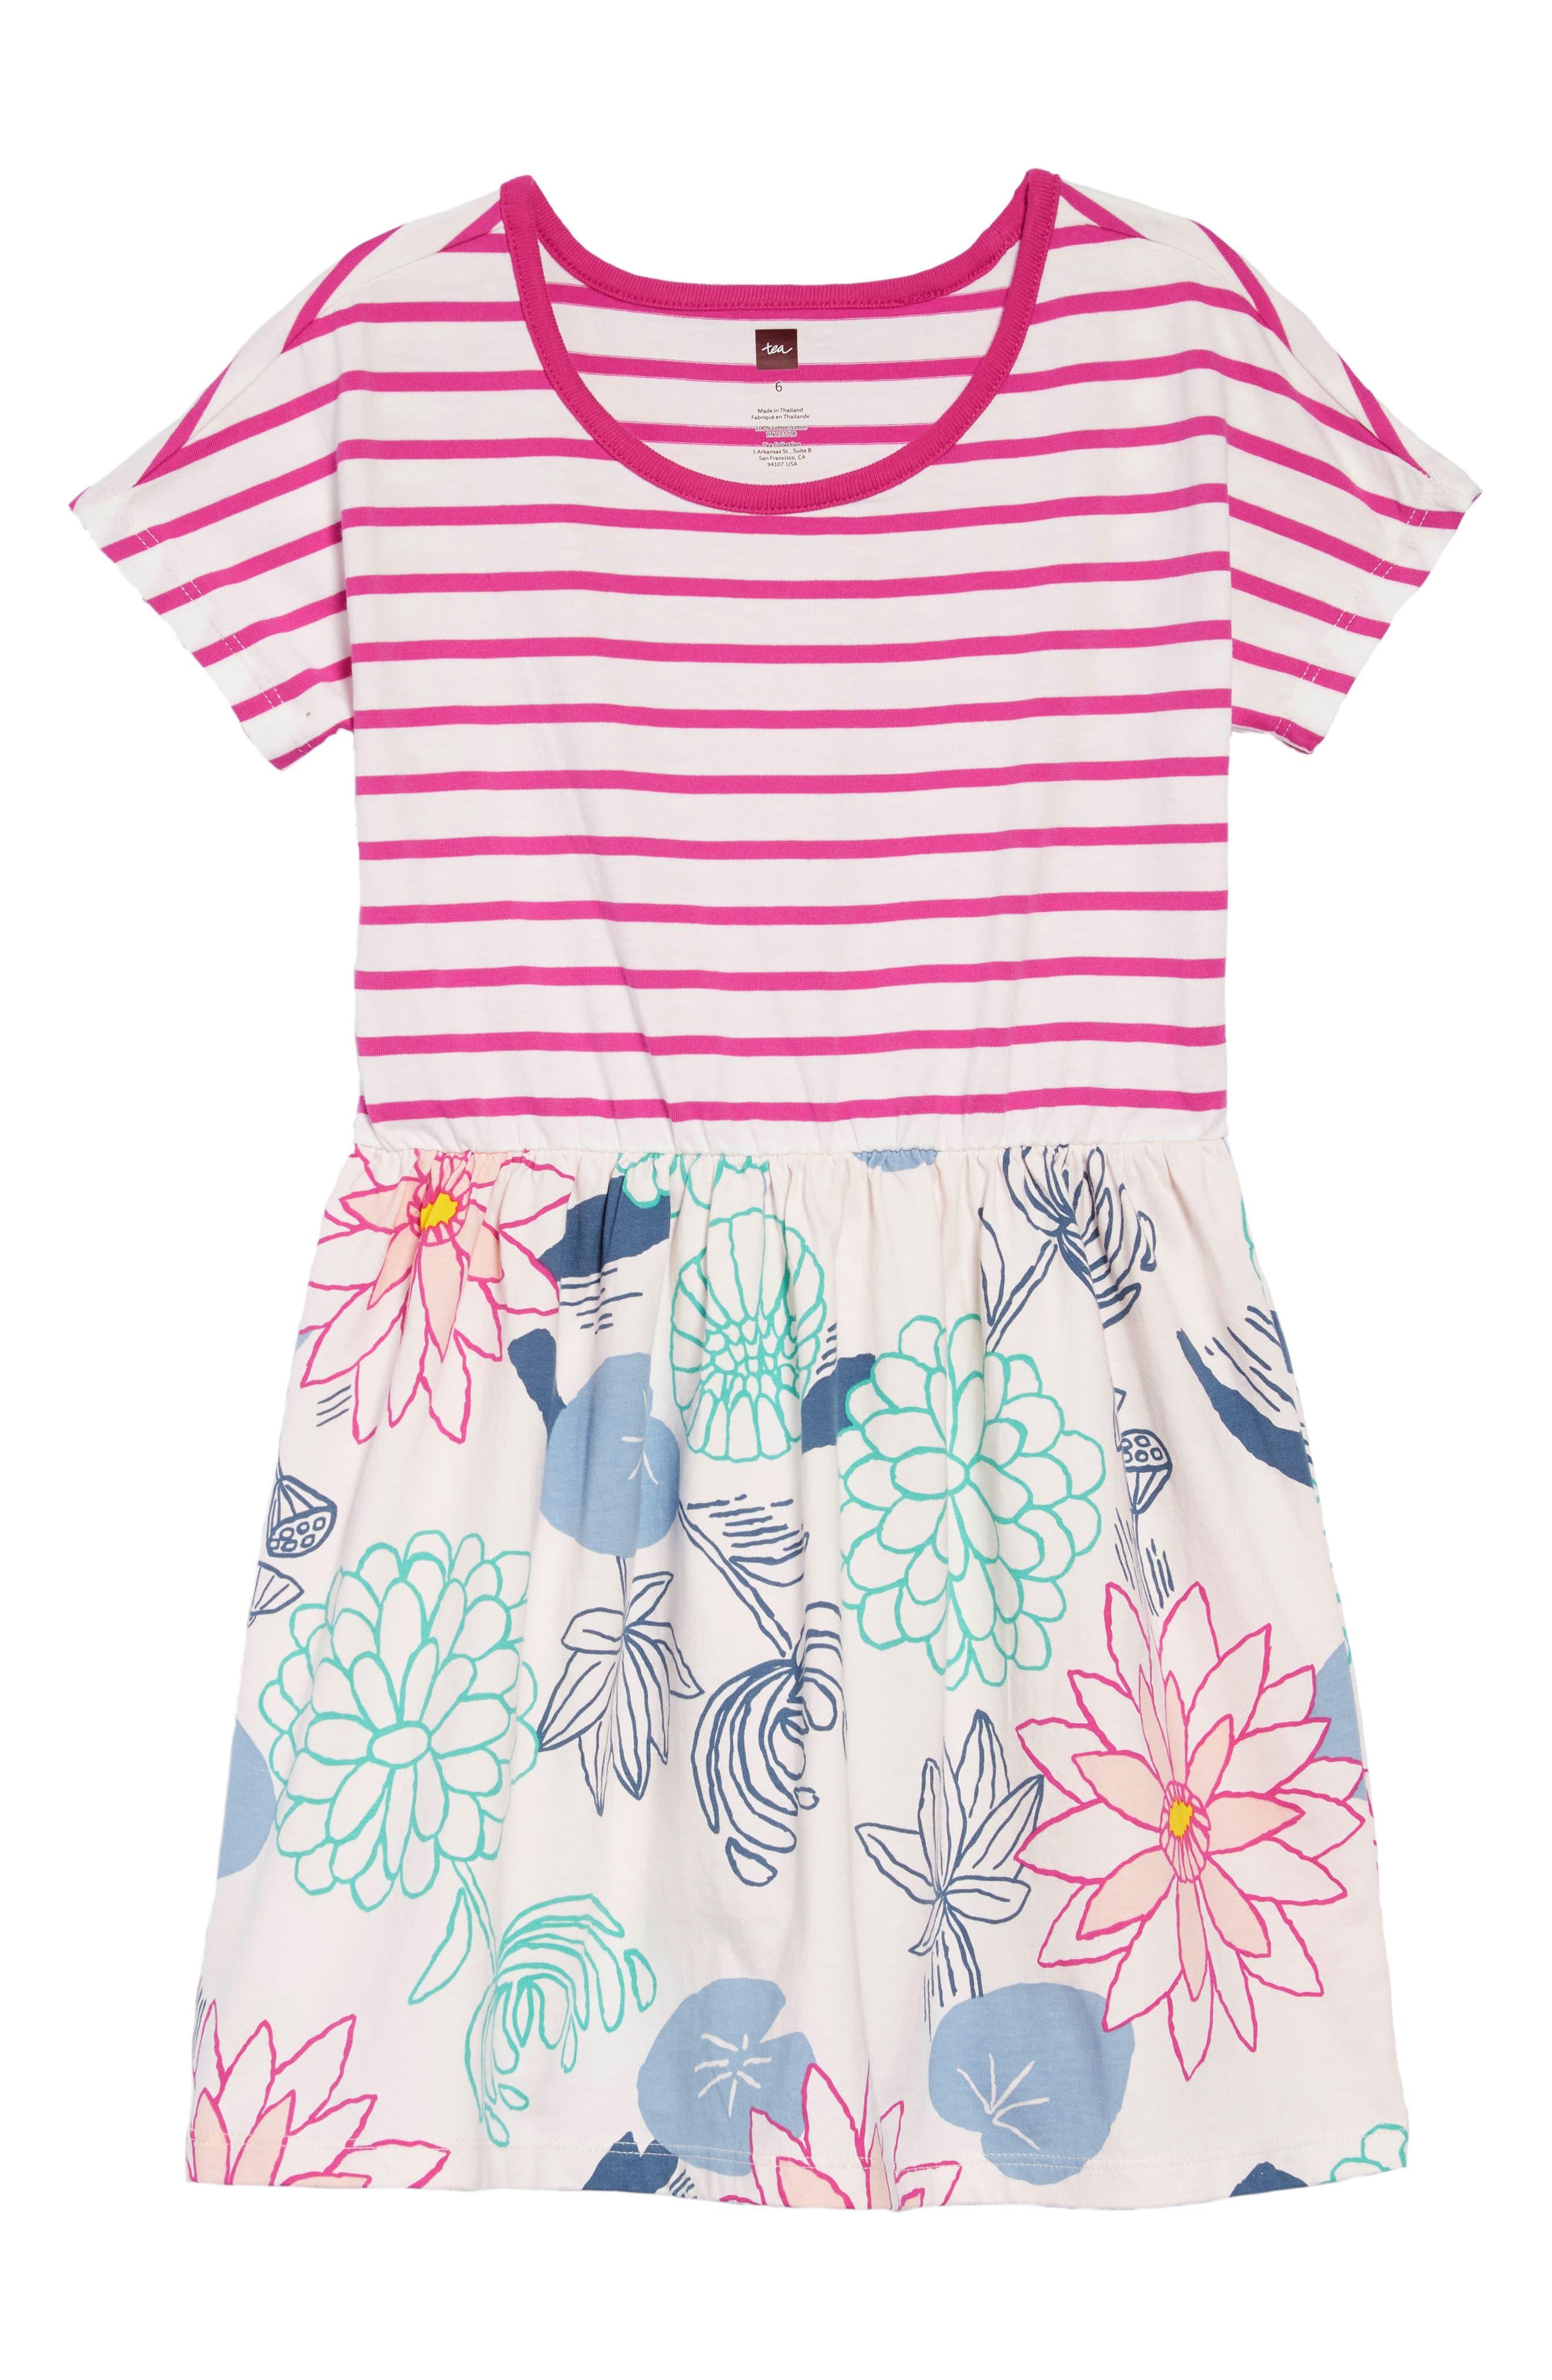 Mixed Print Dress,                             Main thumbnail 1, color,                             LILYPAD FLORAL - SILKWORM